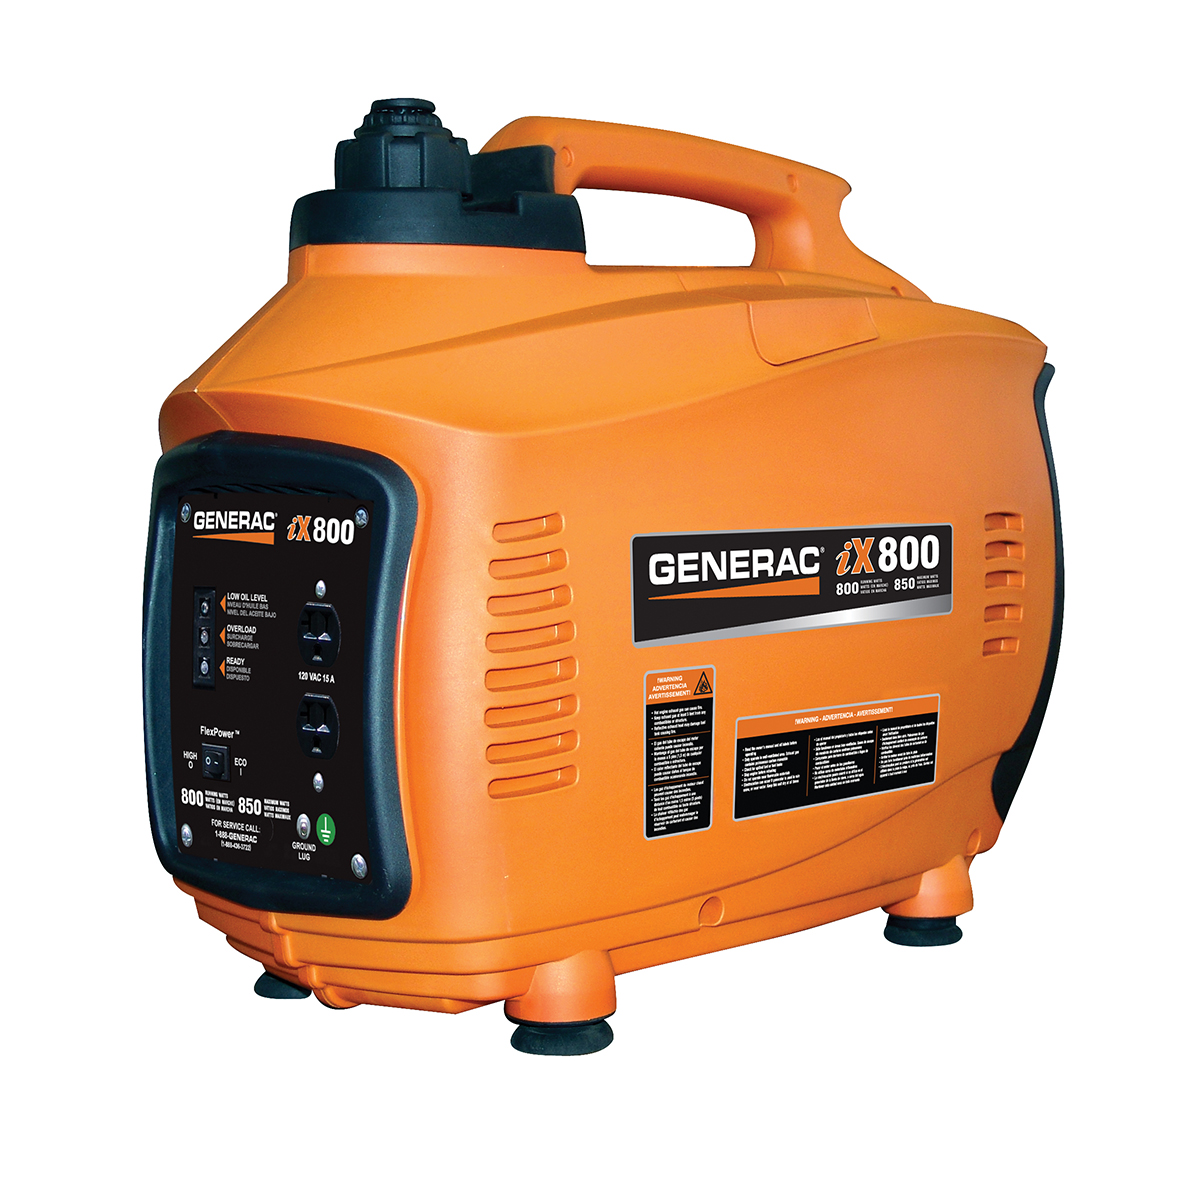 5791- 800 Watt Inverter Portable Generator, 50 State/CARB/CETL